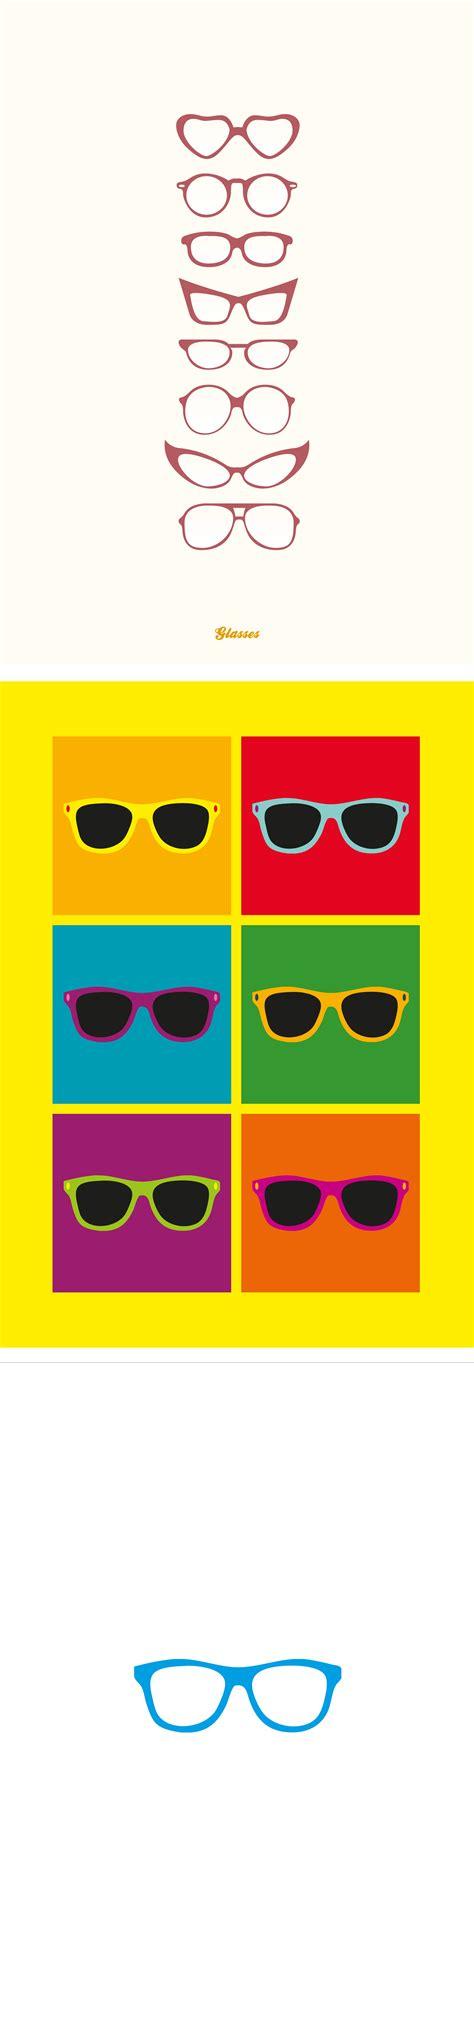 glasses glasses glasses card designs  wwwmyworldco